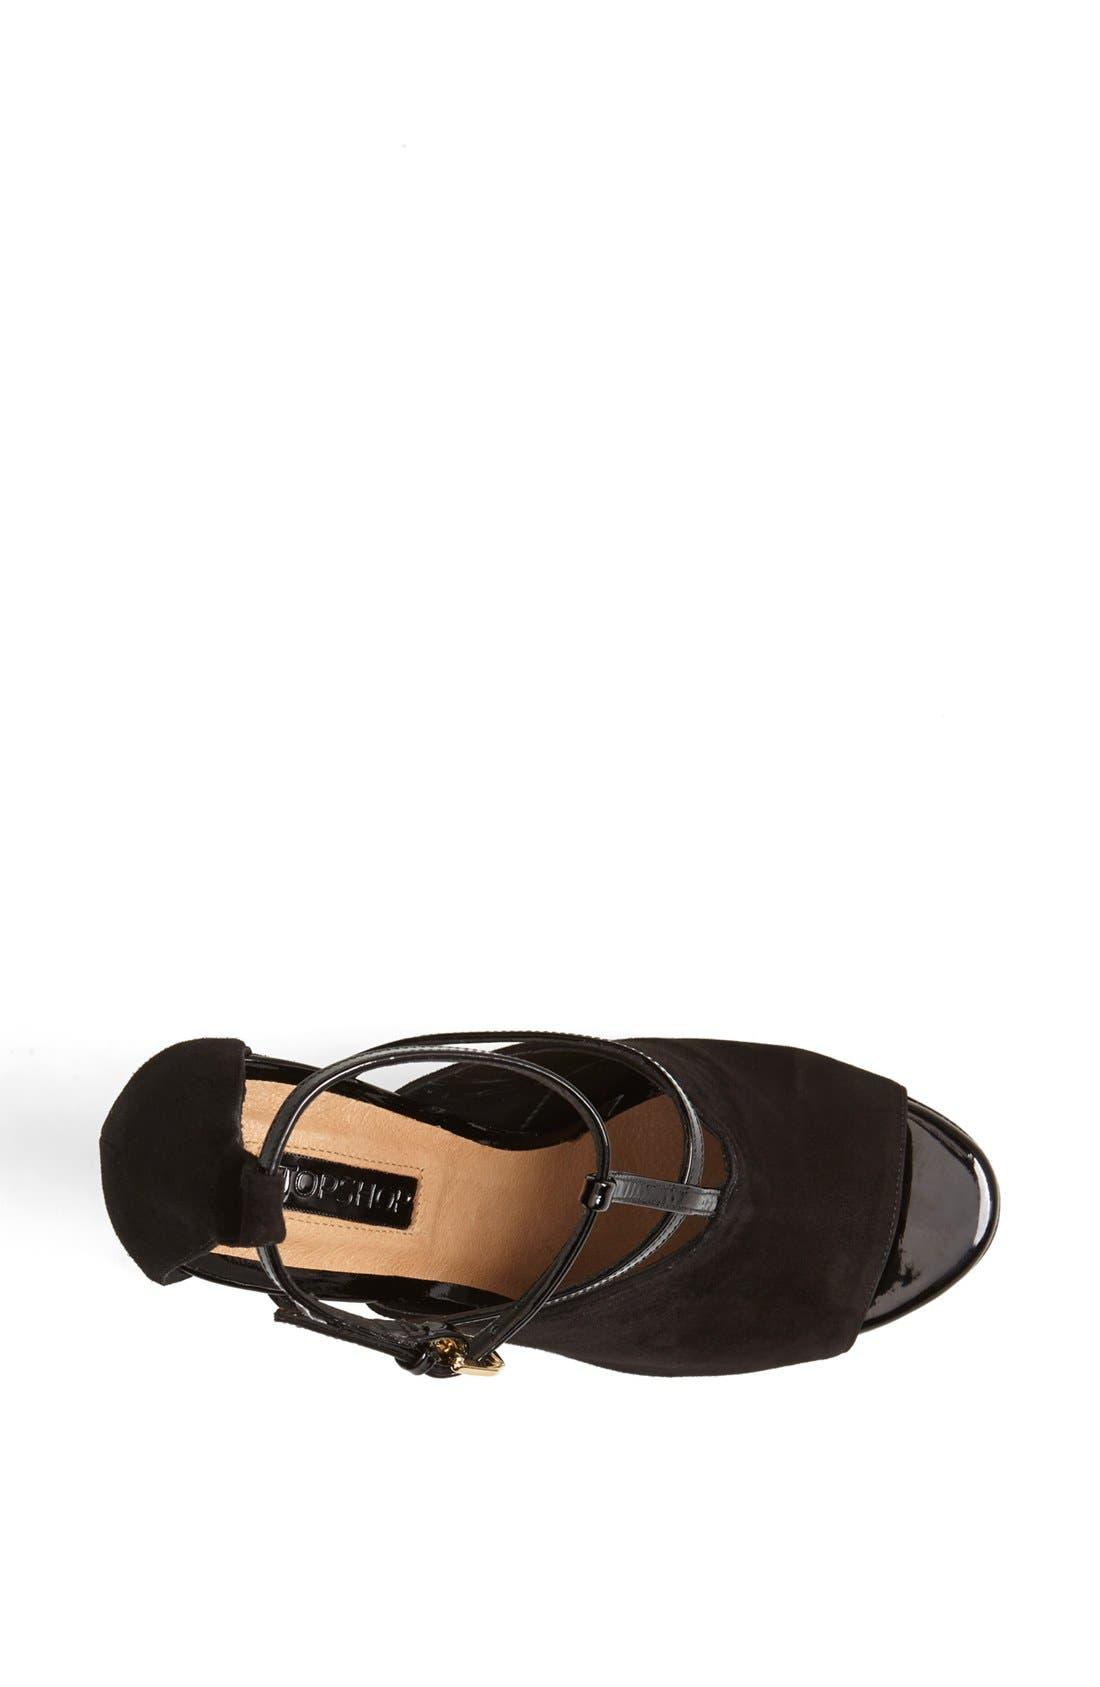 Alternate Image 3  - Topshop 'Gamos' Leather Sandal